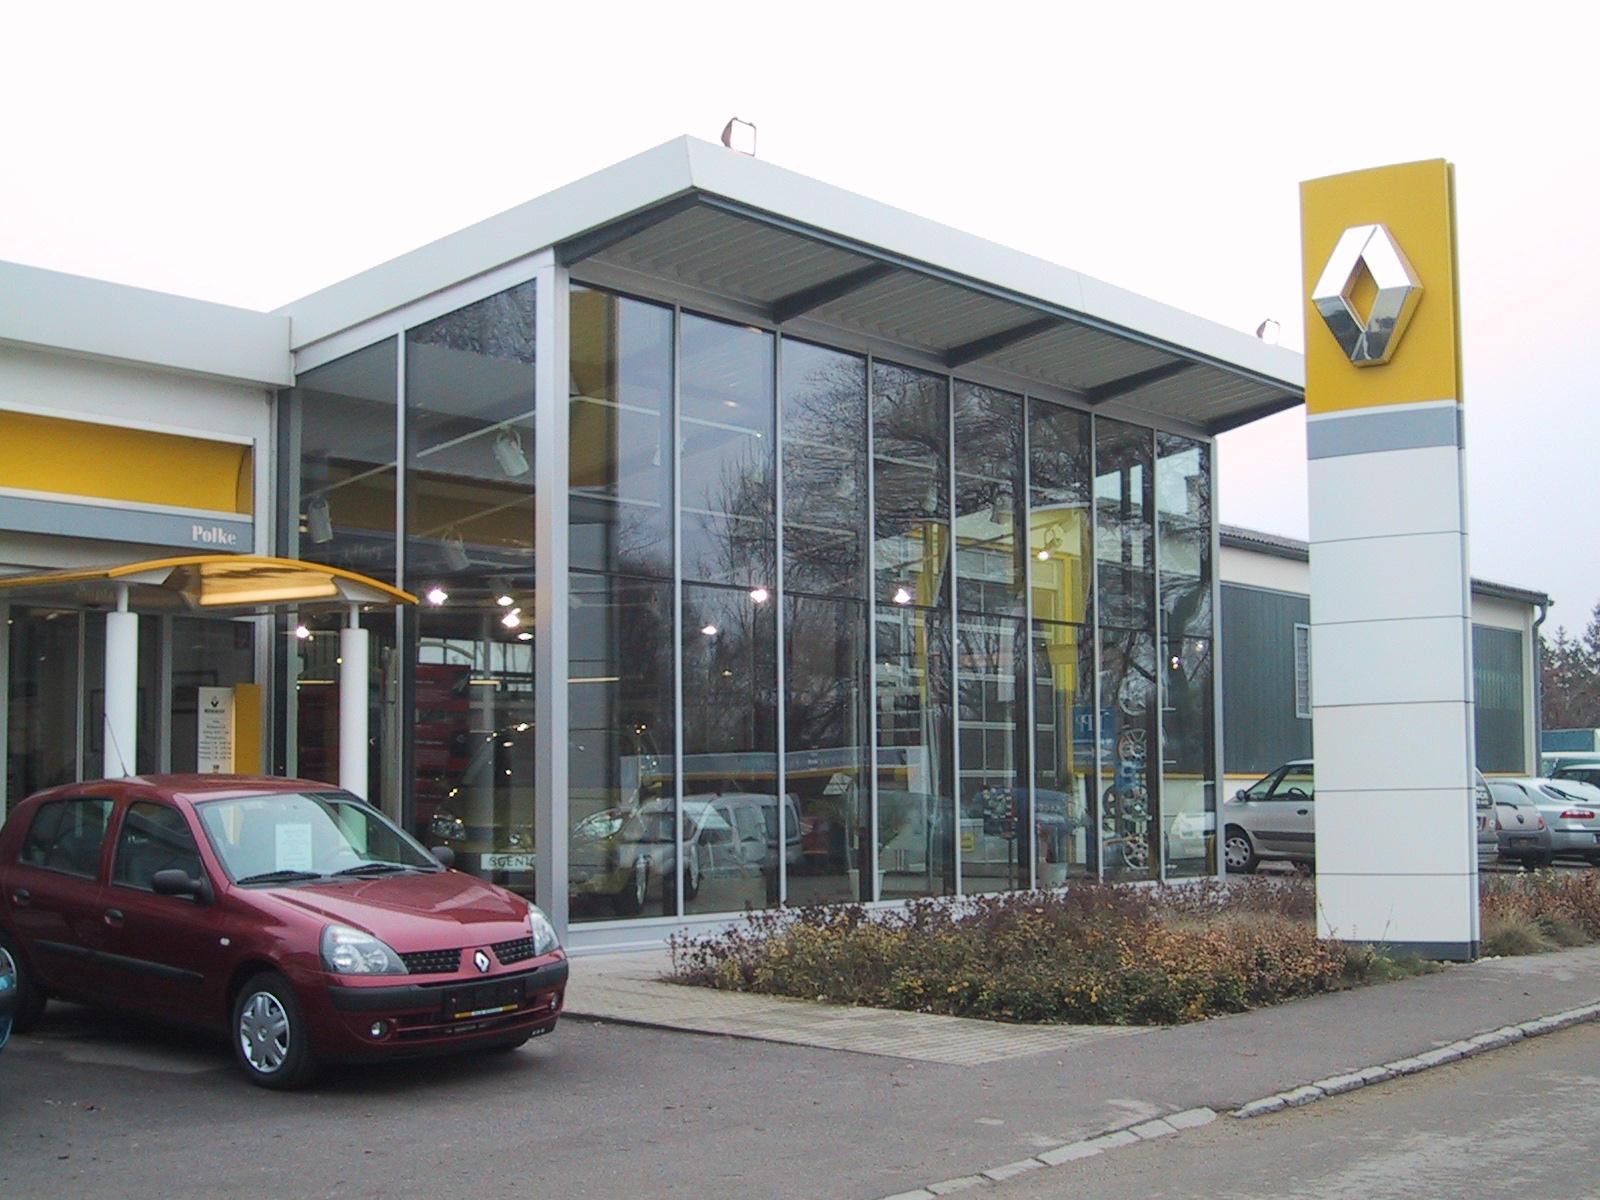 Autohaus Renault Polke Mistelbach